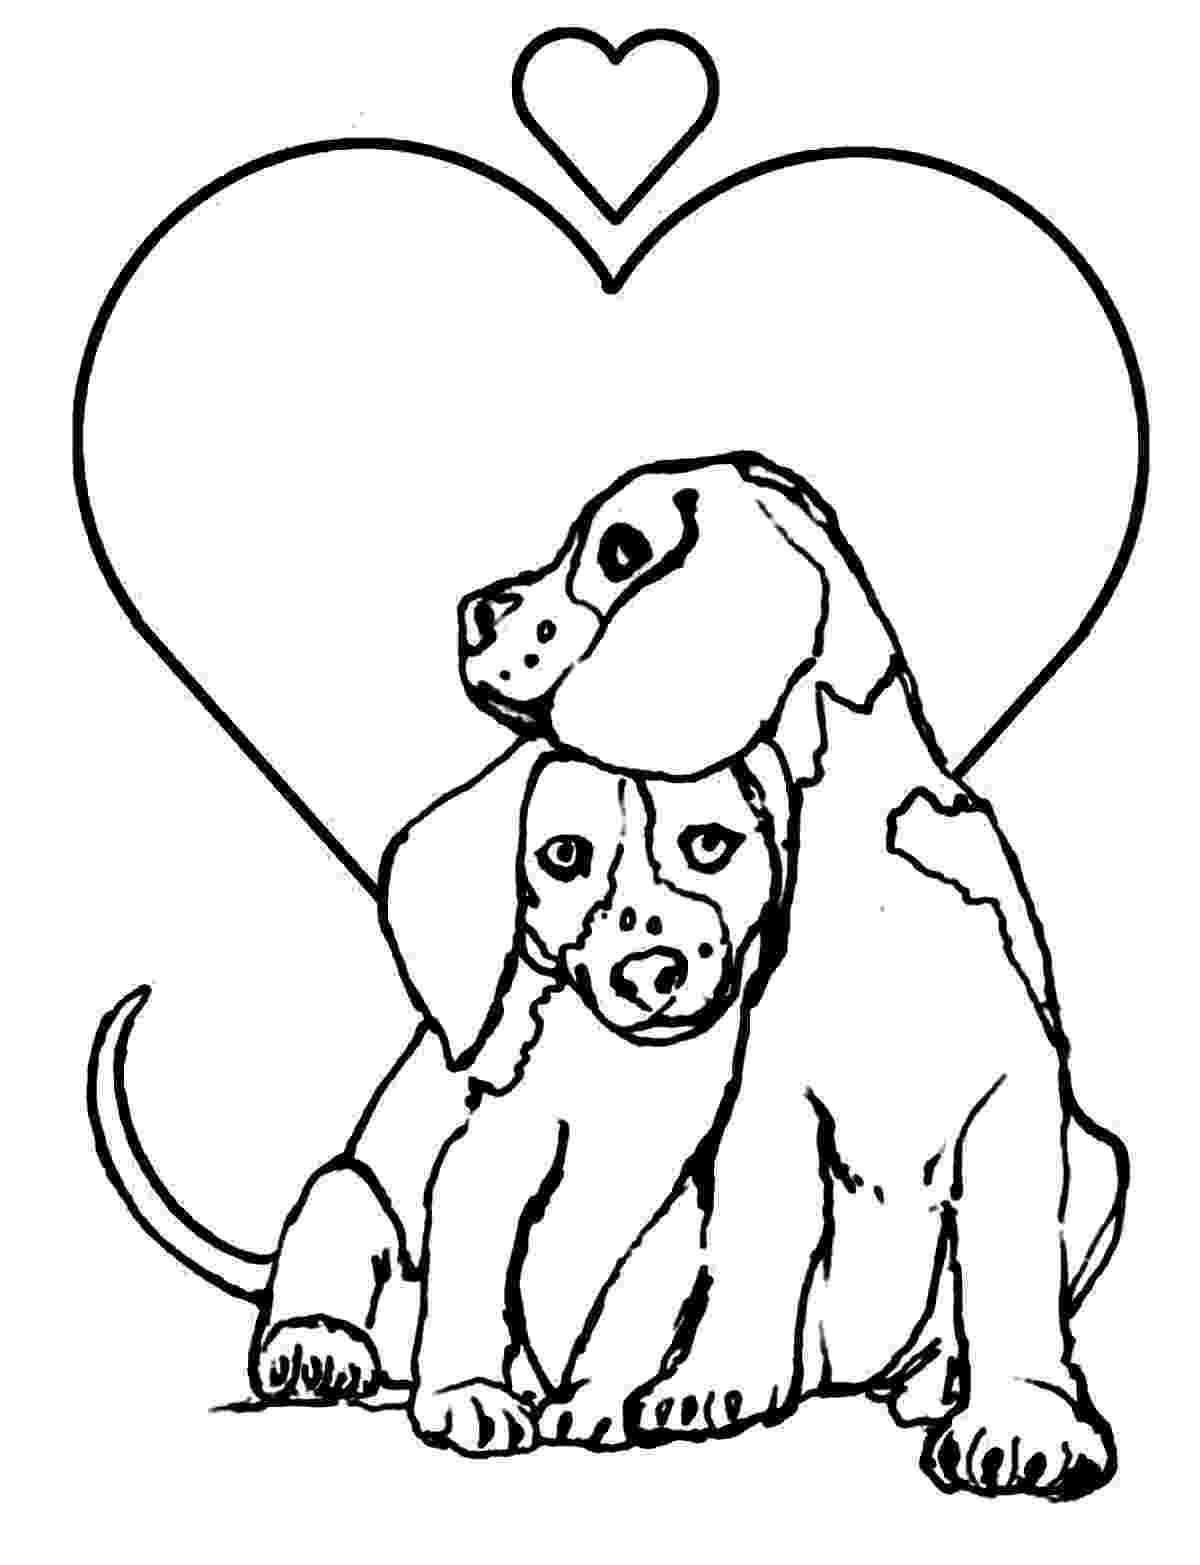 dog printable pictures dog for children loving dogs dogs kids coloring pages pictures printable dog